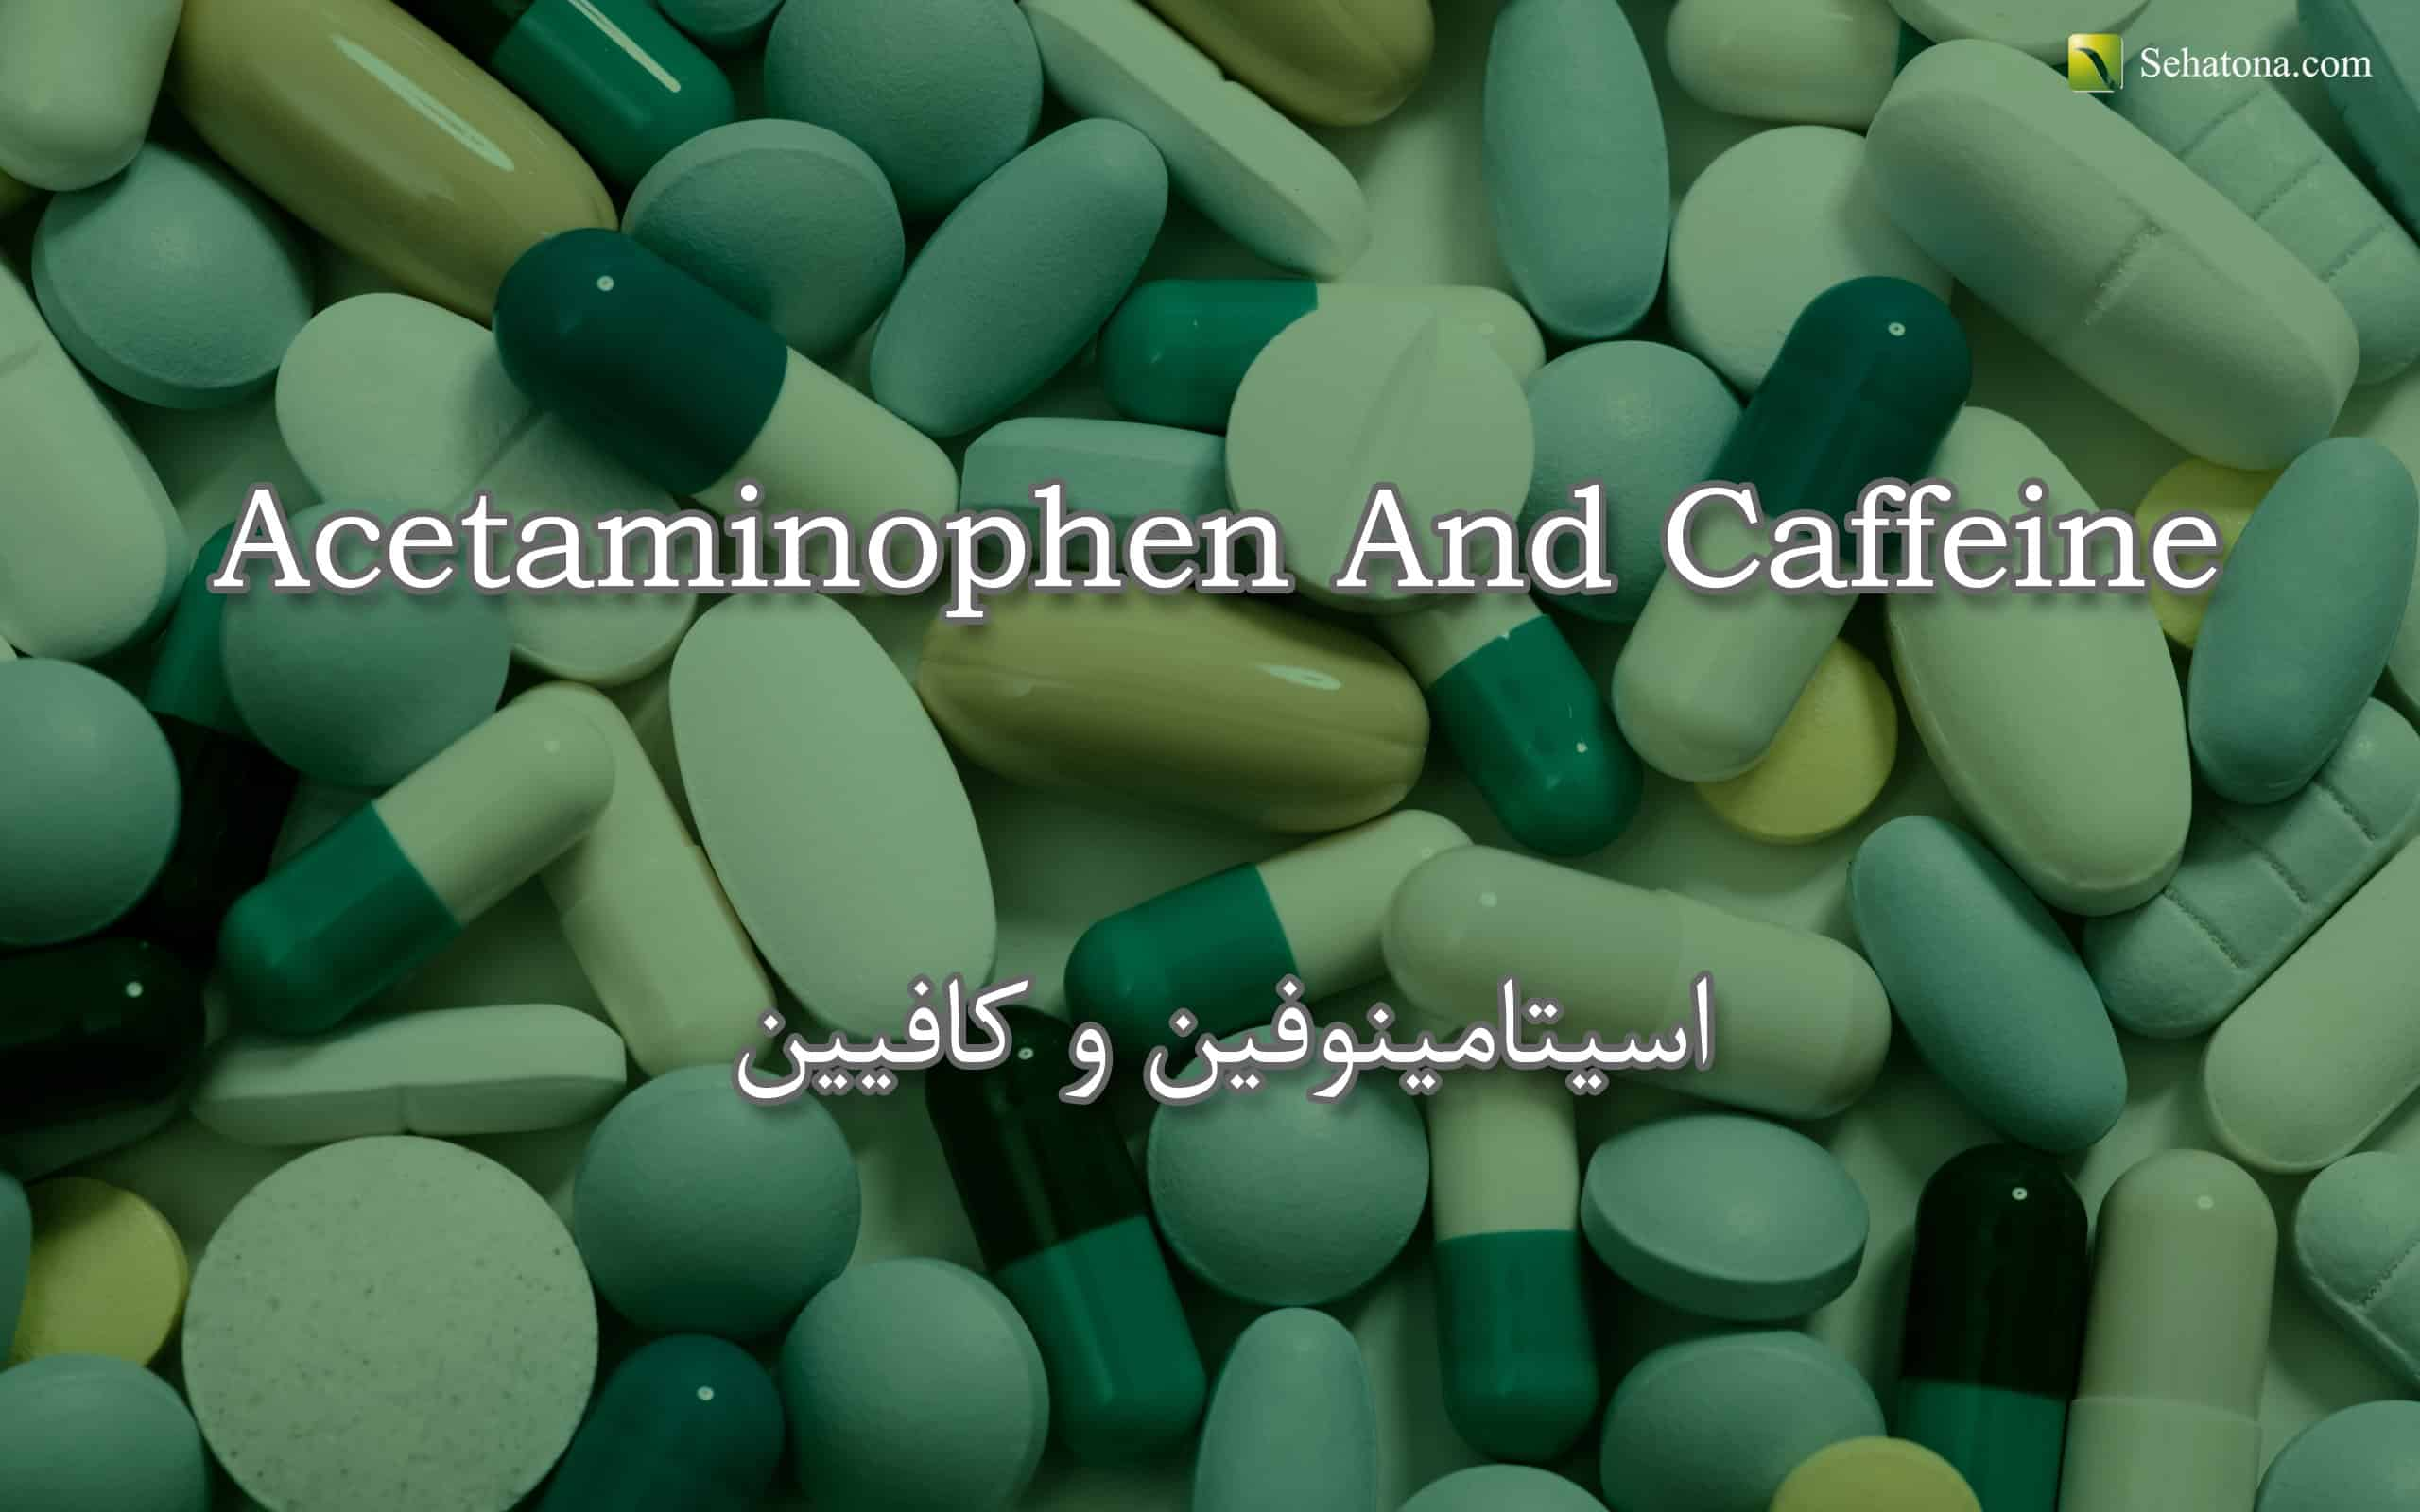 Acetaminophen And Caffeine